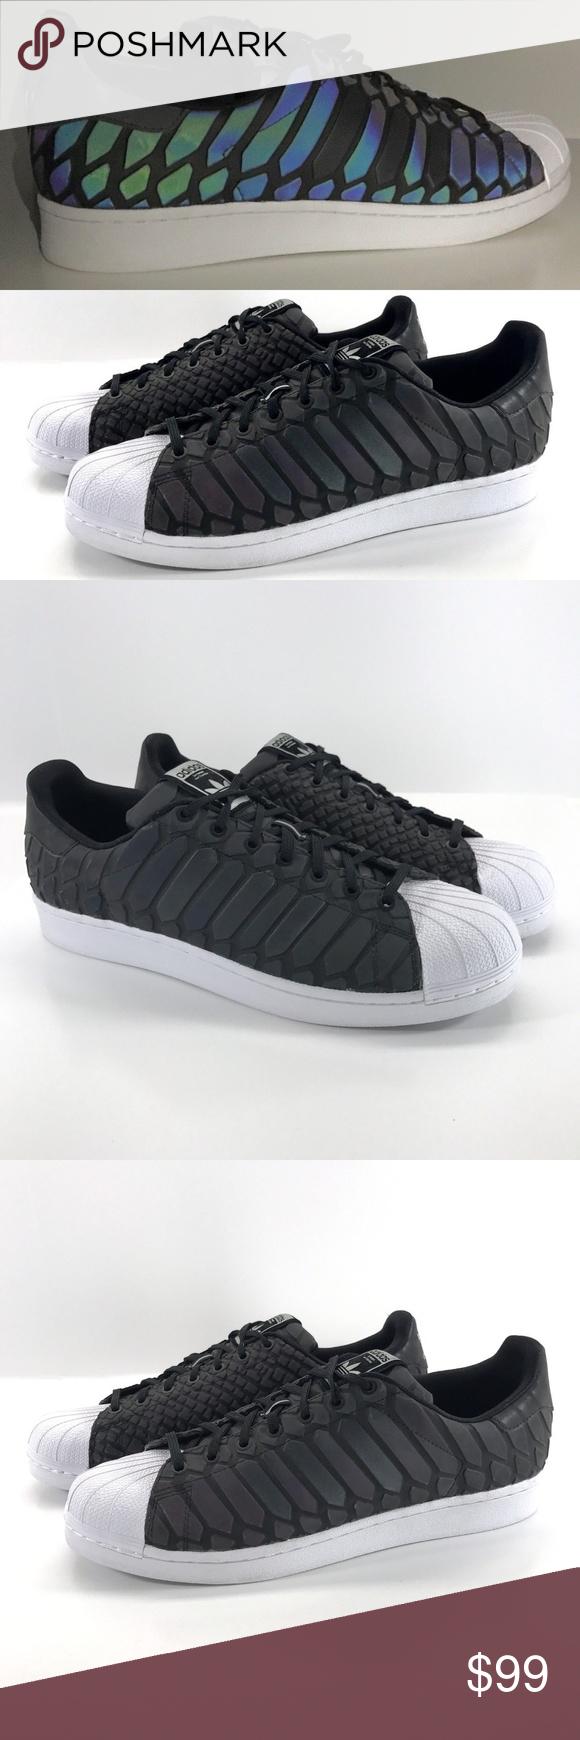 aa186d09fdb Adidas Superstar Xeno Prism 3M D69366 Reflective Adidas Superstar Zeno Men s  Size 12 Black White Lace